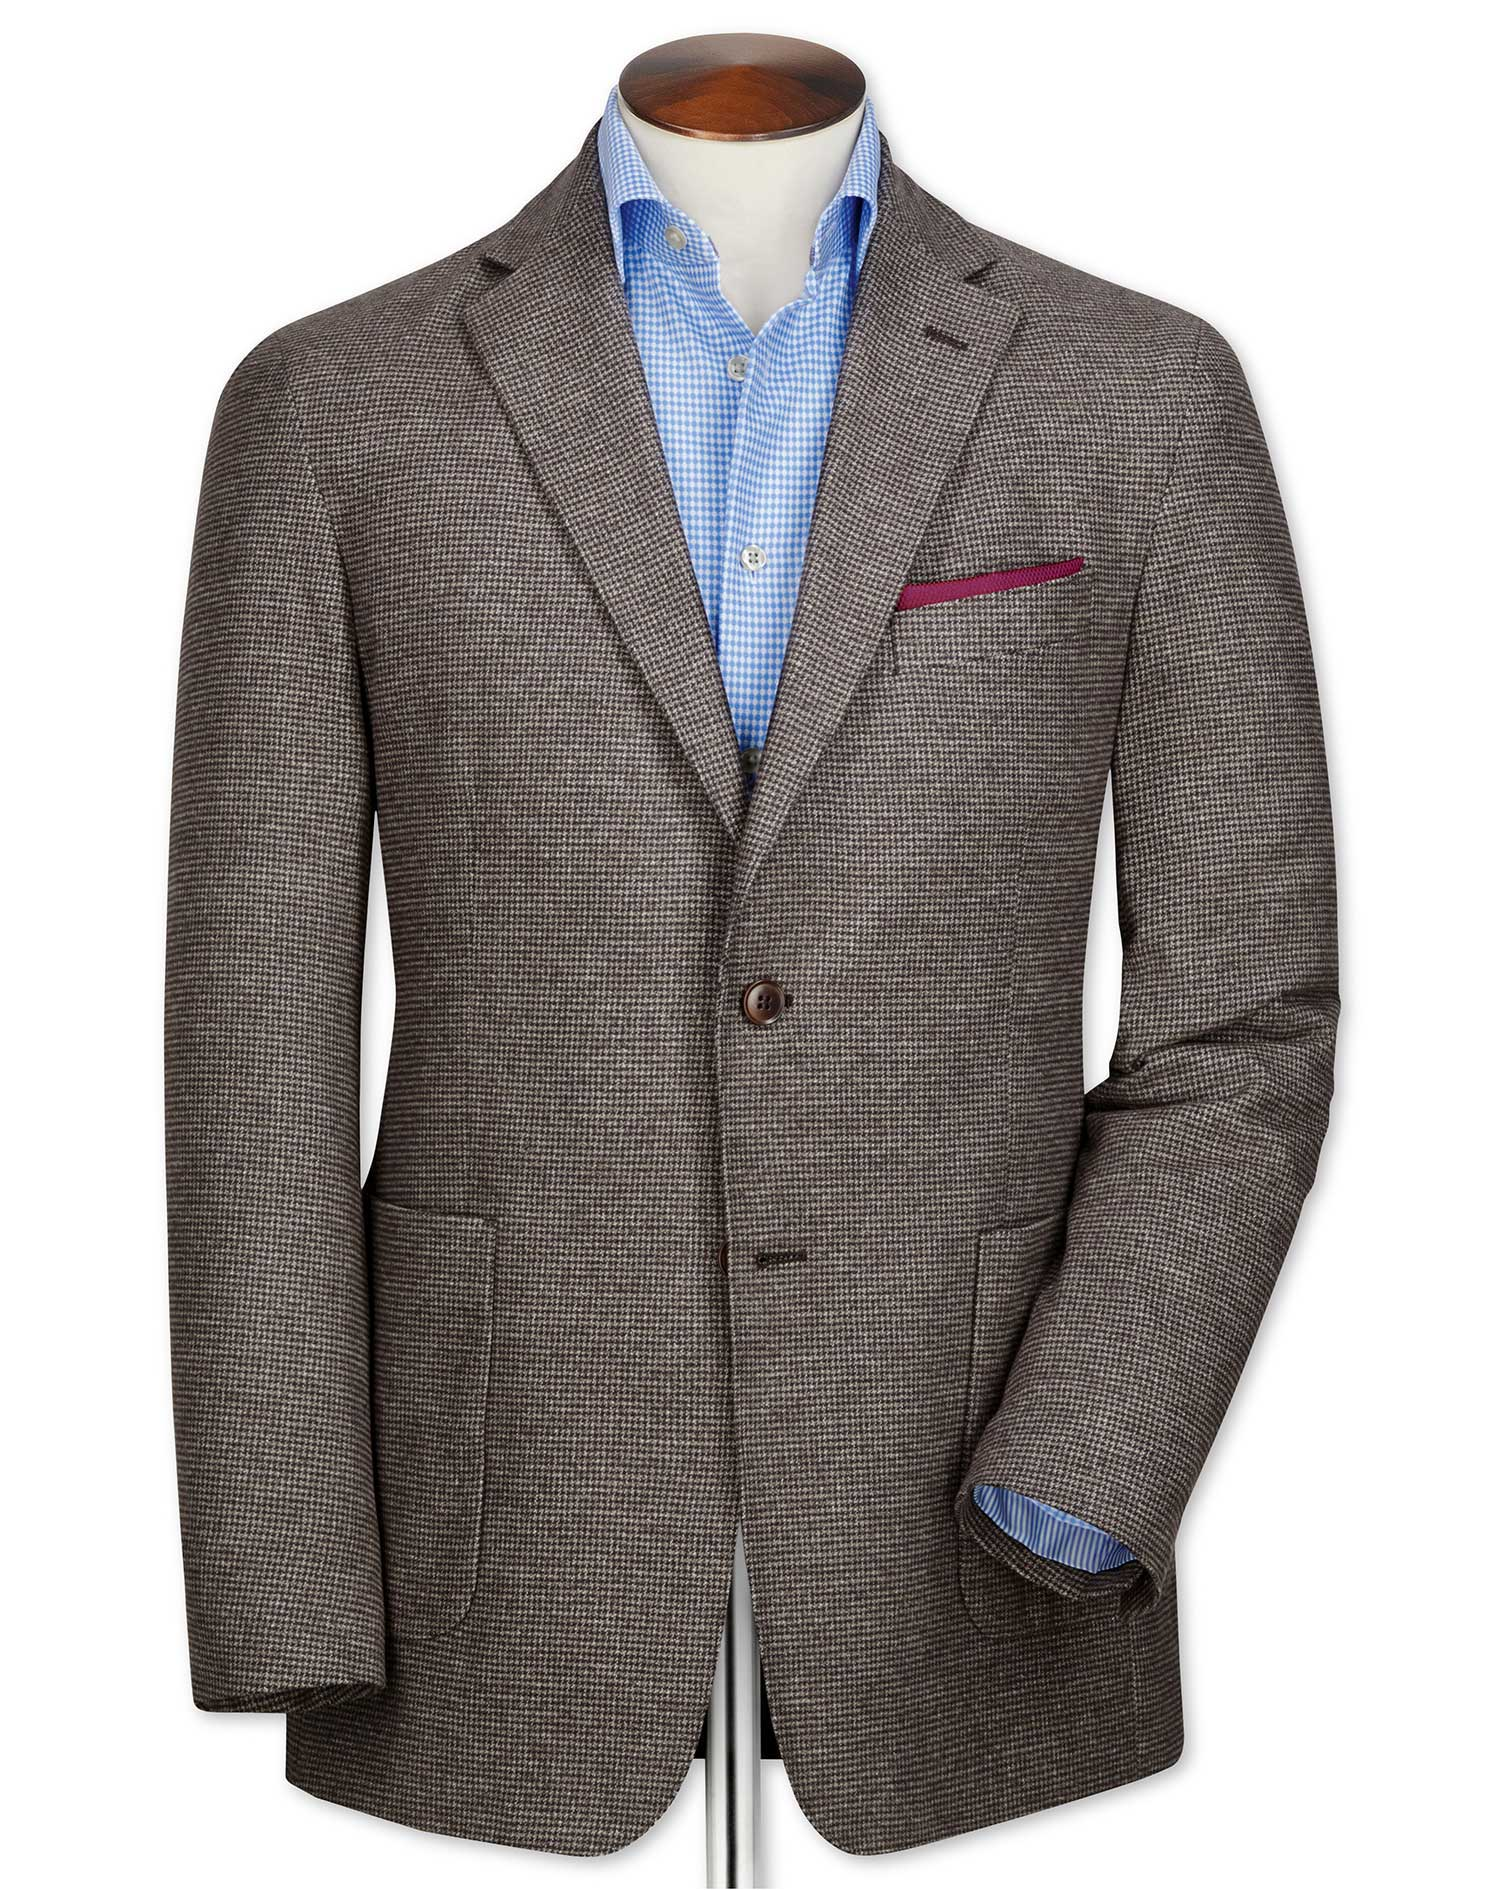 Slim Fit Brown Semi-Plain Cotton Flannel Cotton Jacket Size 42 Short by Charles Tyrwhitt